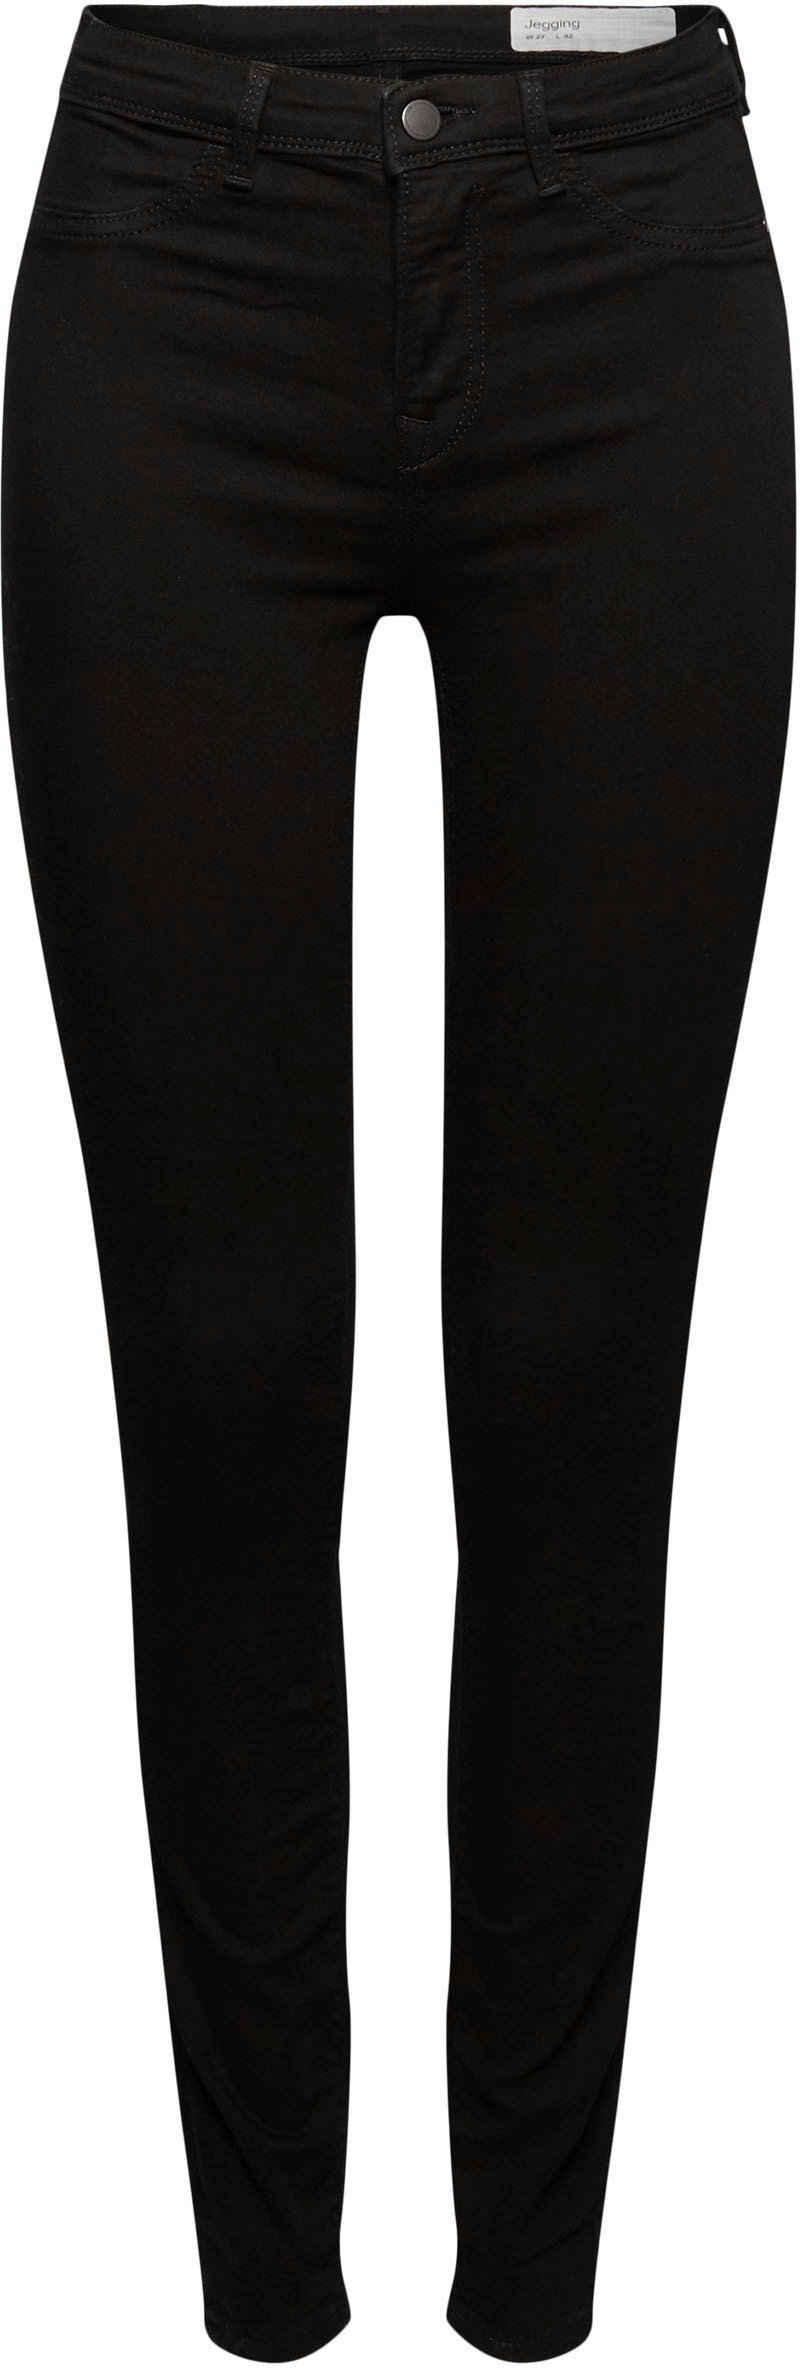 edc by Esprit Skinny-fit-Jeans in klassischer Form